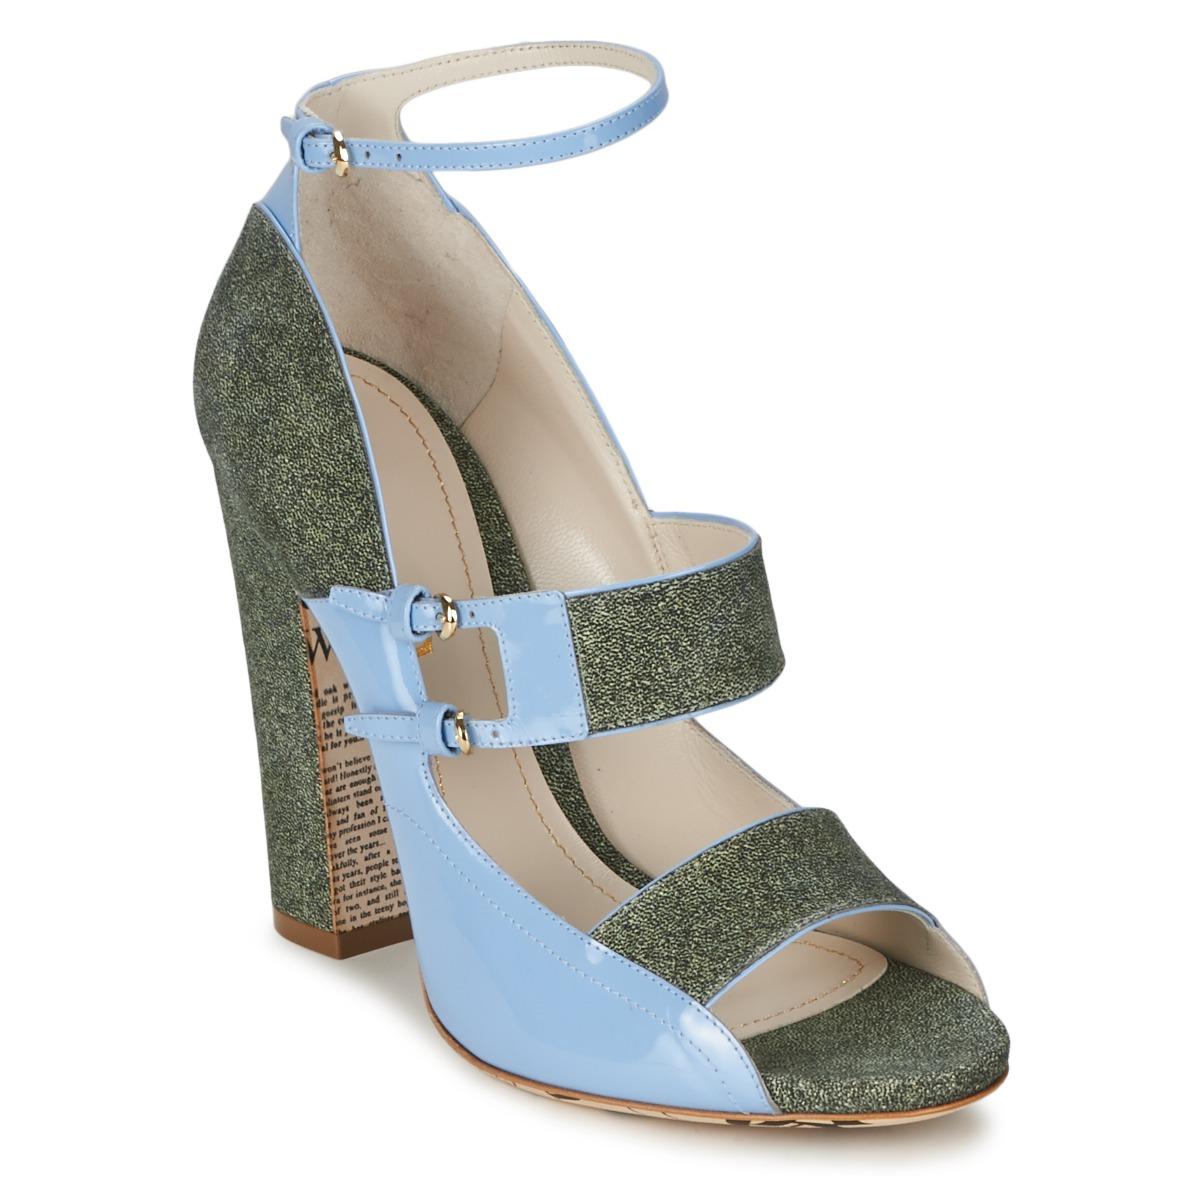 John Galliano A54250 Blau / Grün - Kostenloser Versand bei Spartoode ! - Schuhe Sandalen / Sandaletten Damen 406,30 €